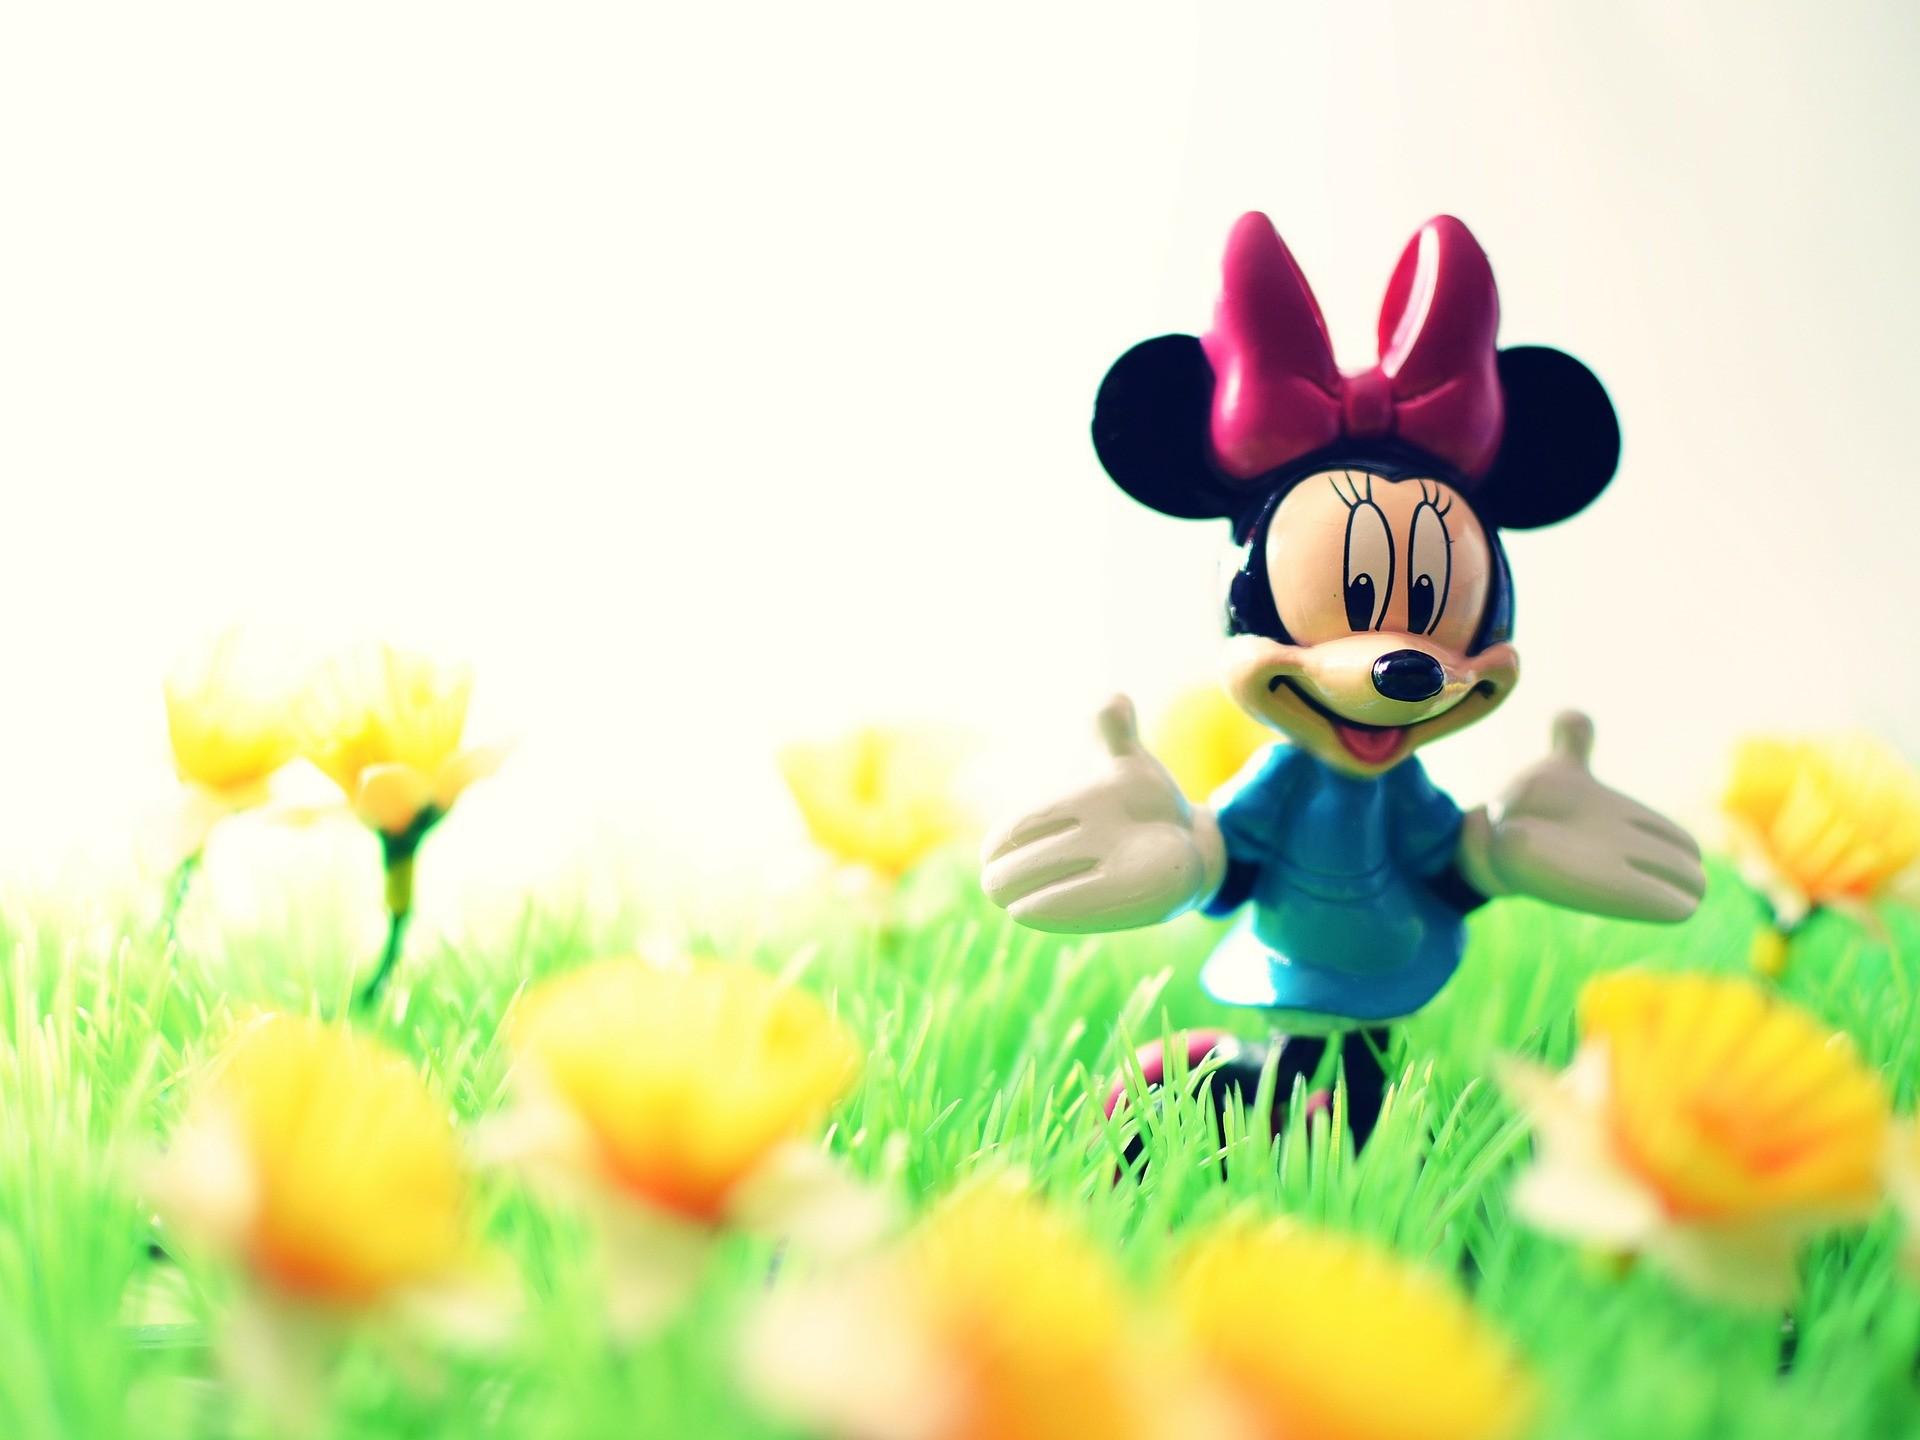 Minnie Mouse Wallpaper Minnie Mouse Wallpaper …